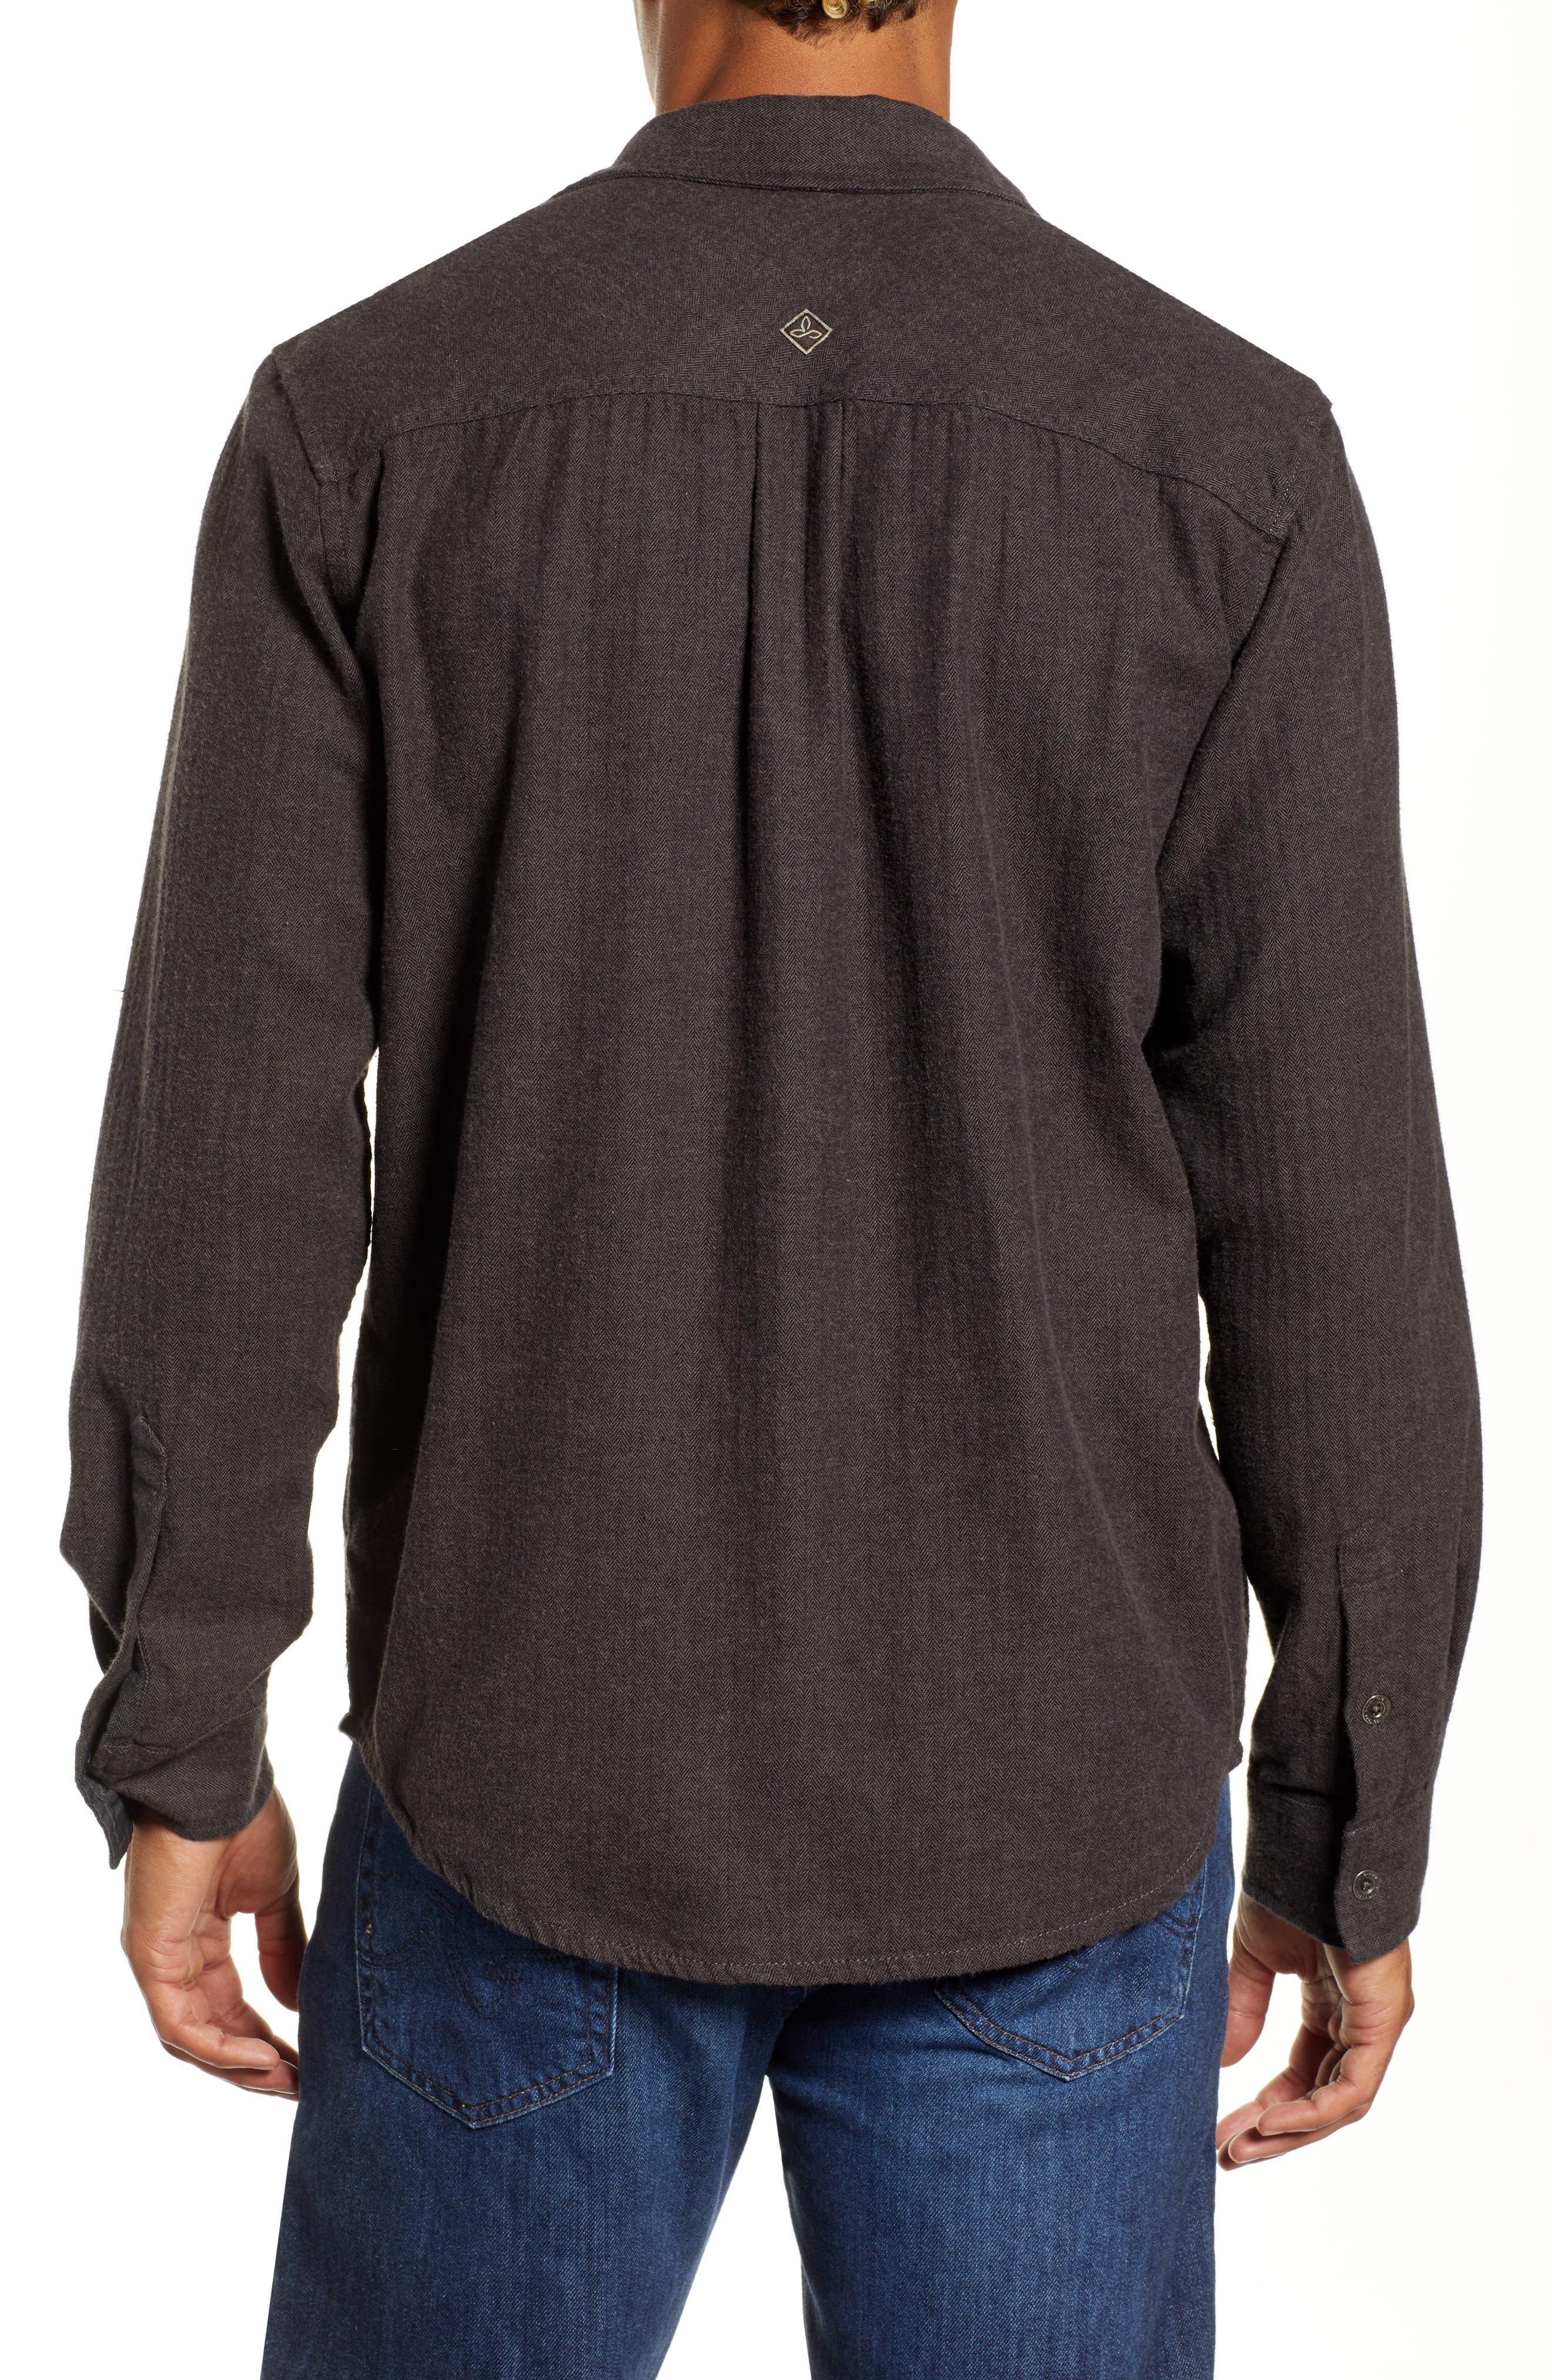 Lybek Regular Fit Herringbone Flannel Shirt,                             Alternate thumbnail 3, color,                             SCORCHED BROWN HERRINGBONE